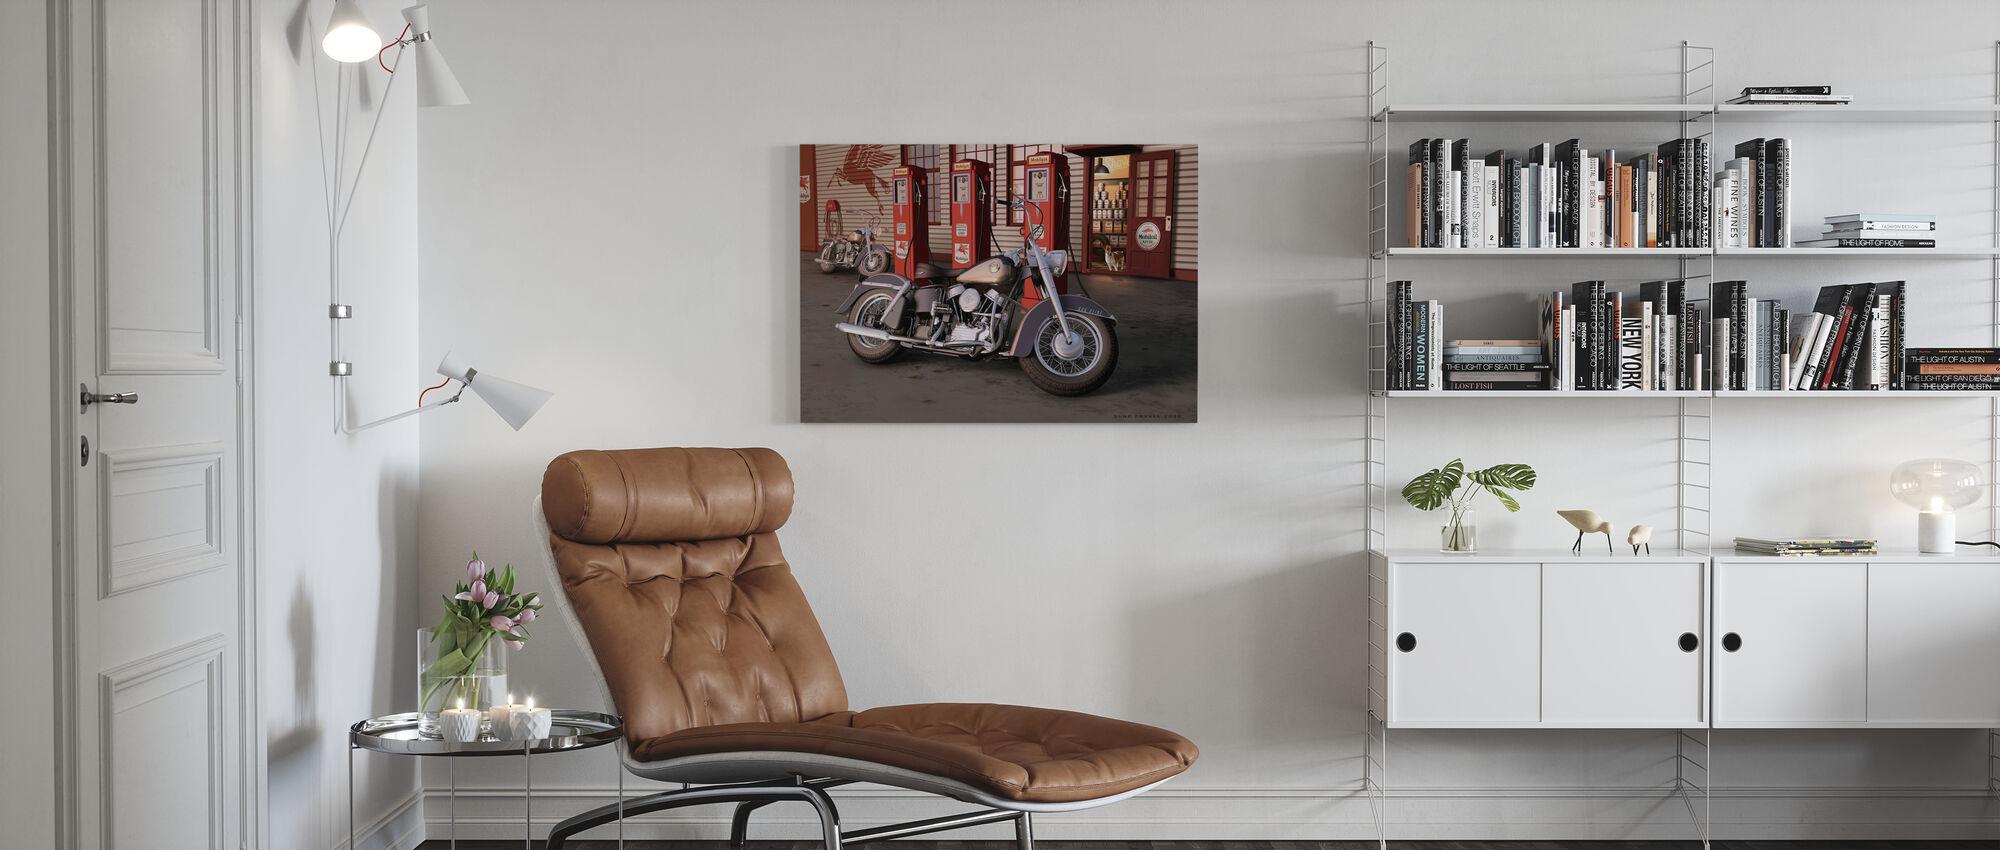 Twilight Dogs - Canvas print - Living Room